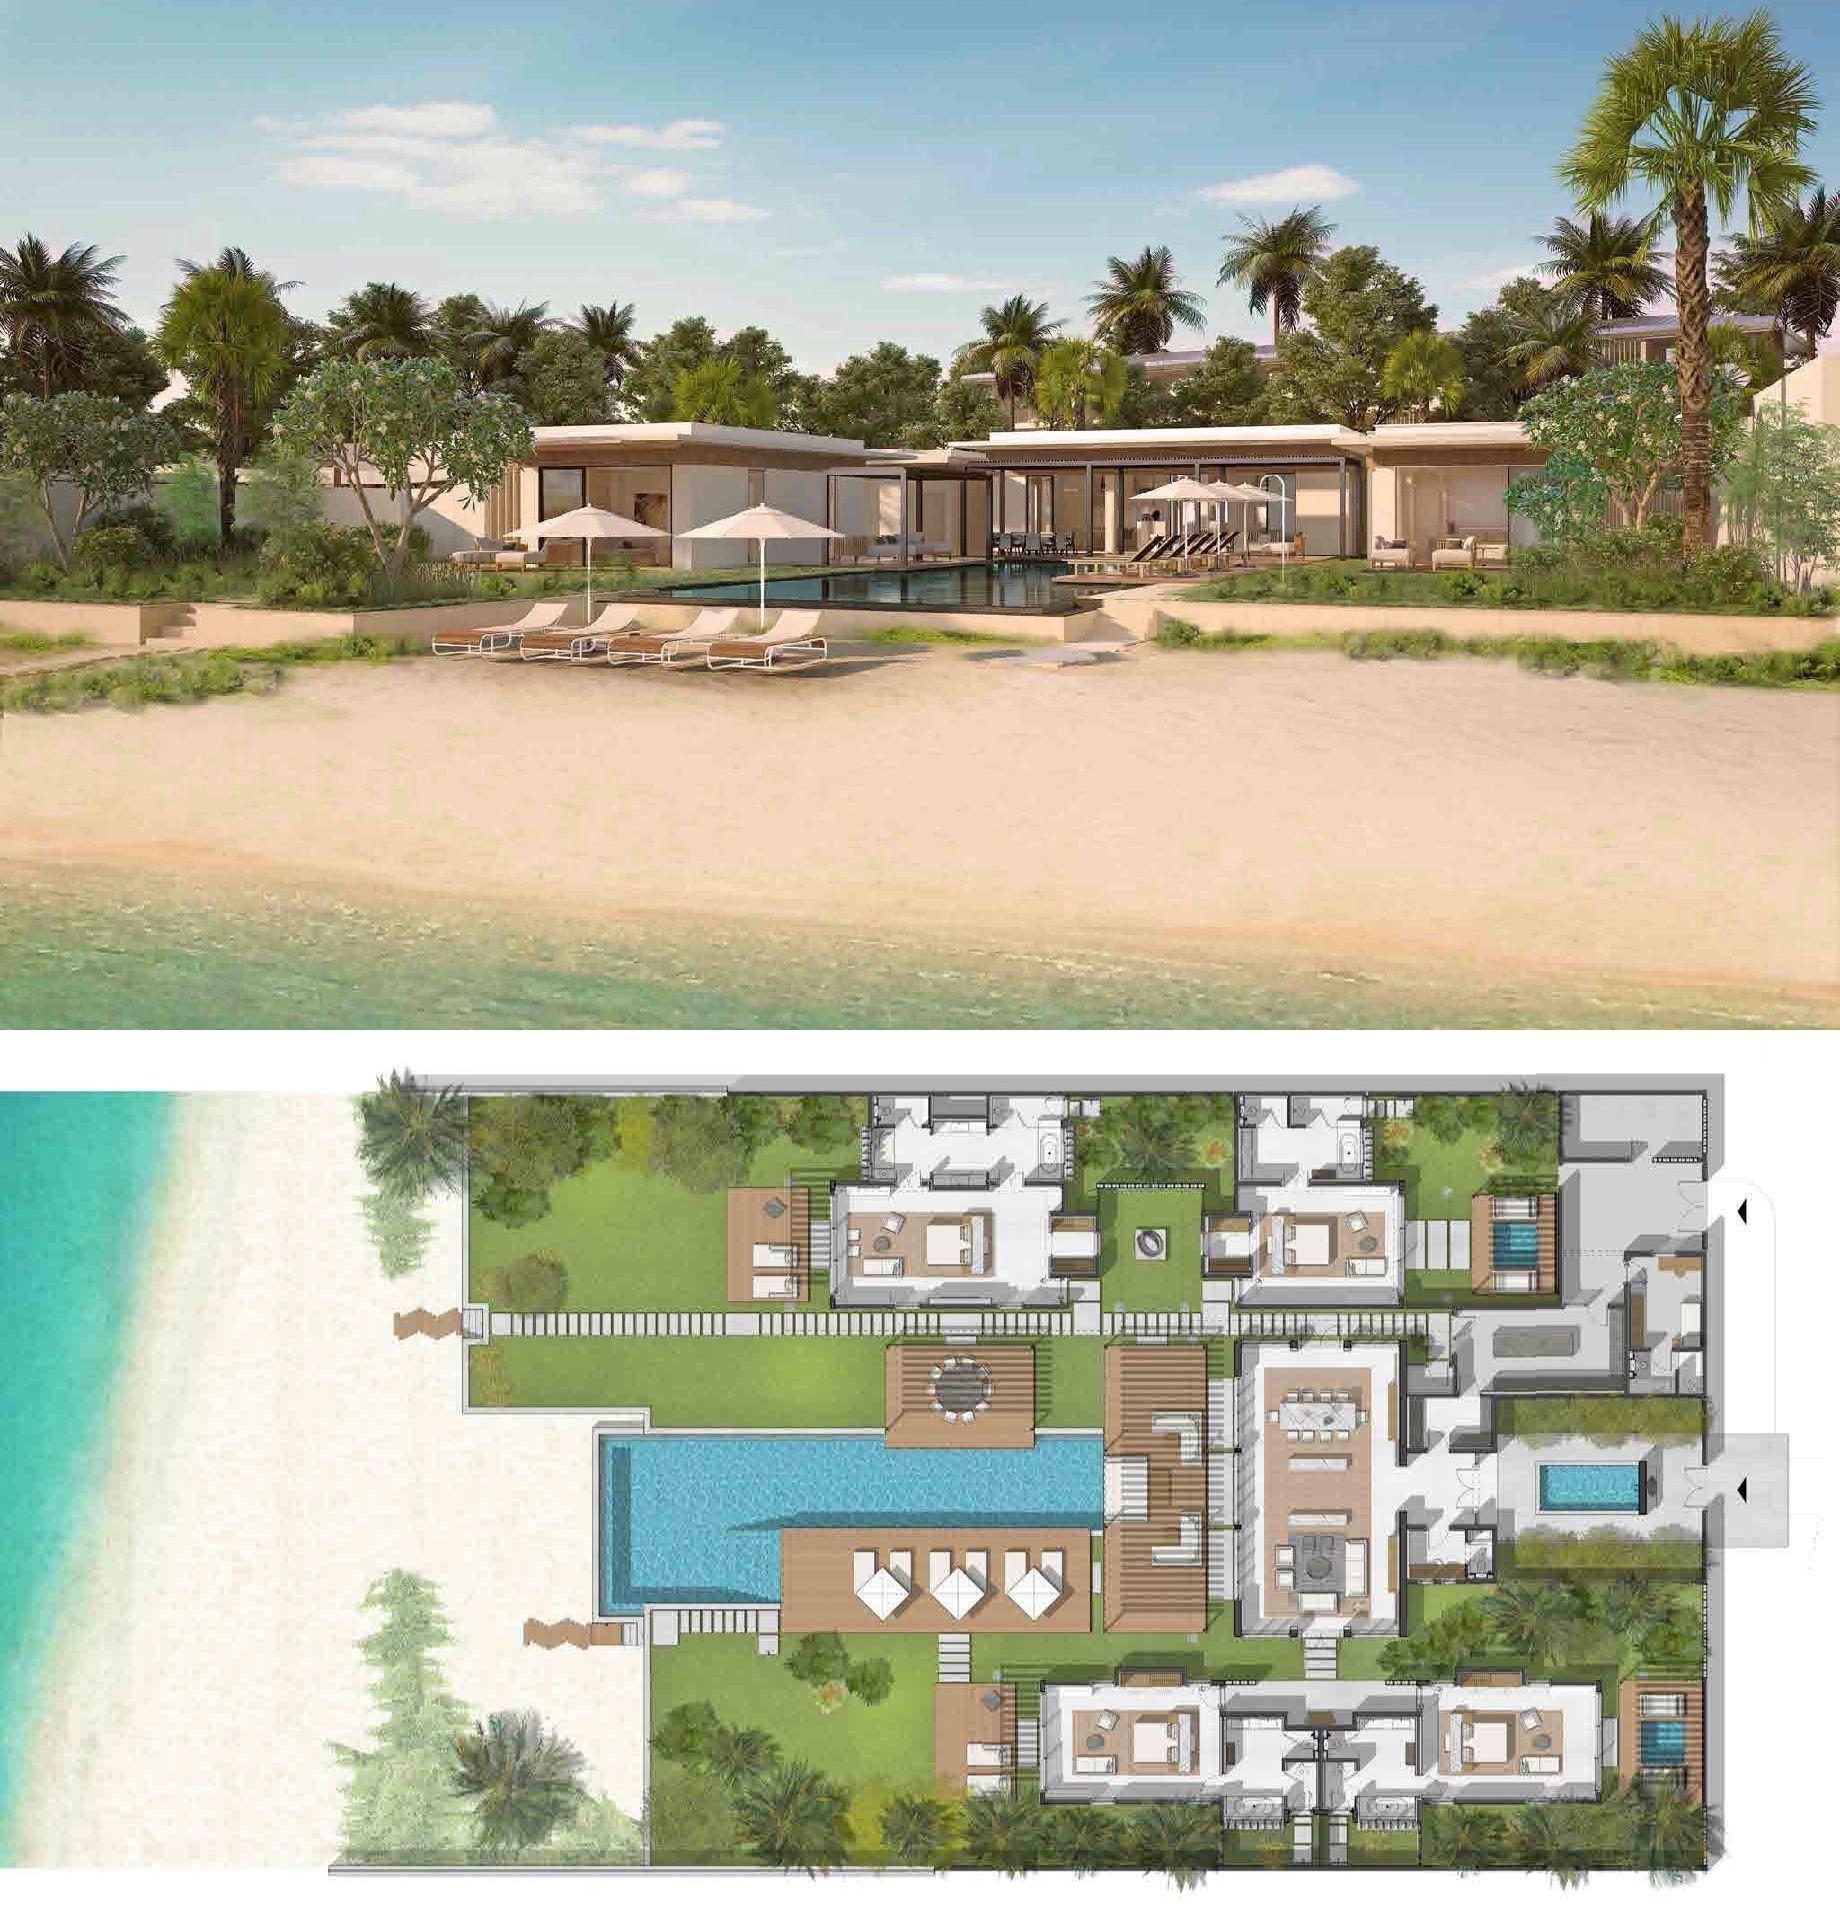 Silversands Luxury Hotel And Private Villas In Grenada Luxury Garden Resort Plan House Plans